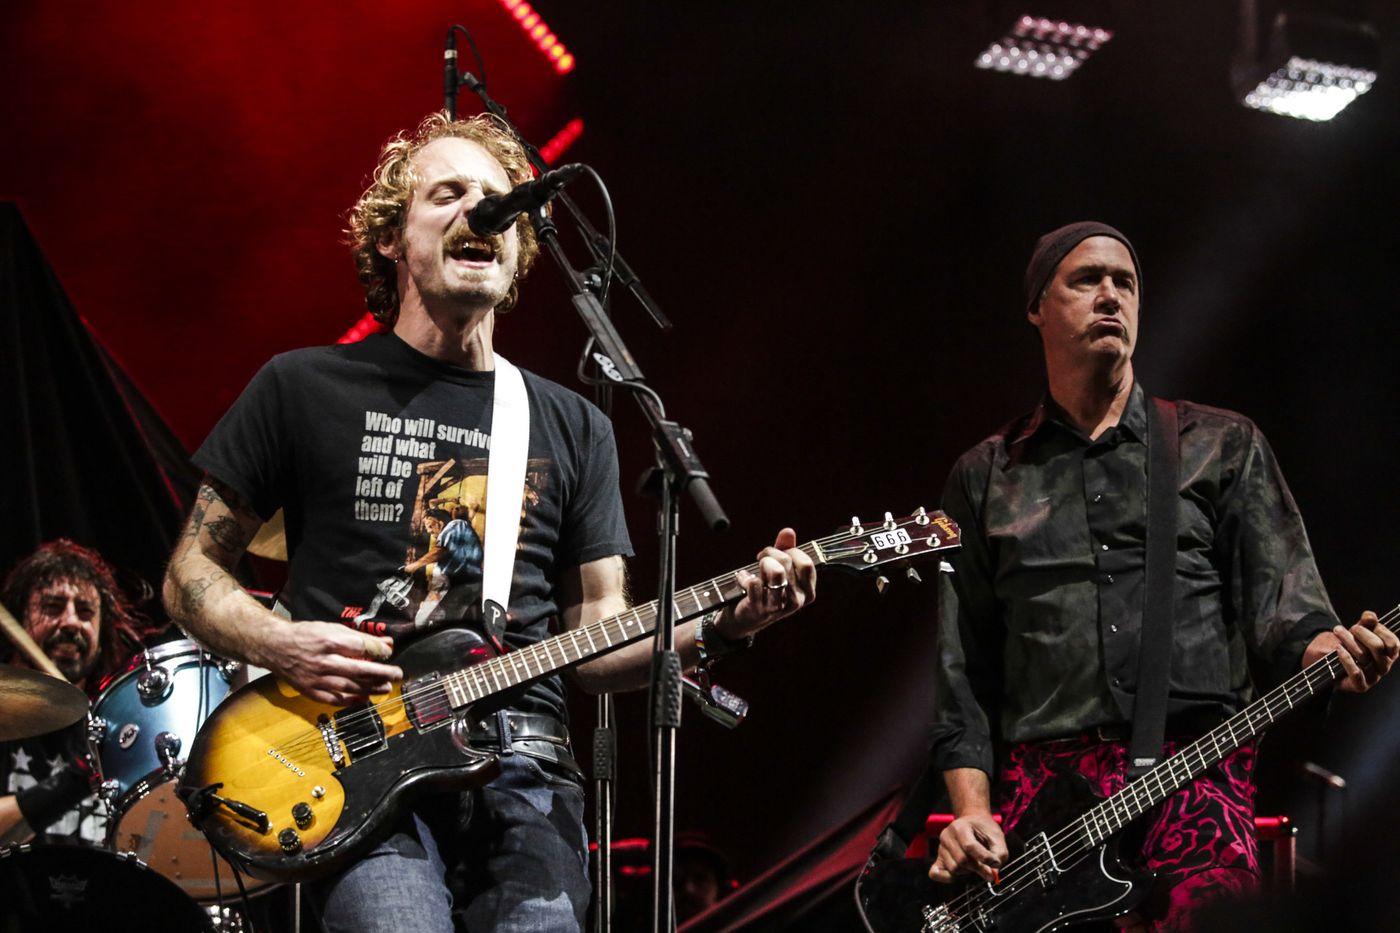 John McCauley, center, plays with Dave Grohl, left, and Krist Novoselic of Nirvana at Saturday's Cal Jam festival. Photo Credit: Maria Alejandra Cardona / Los Angeles Times.